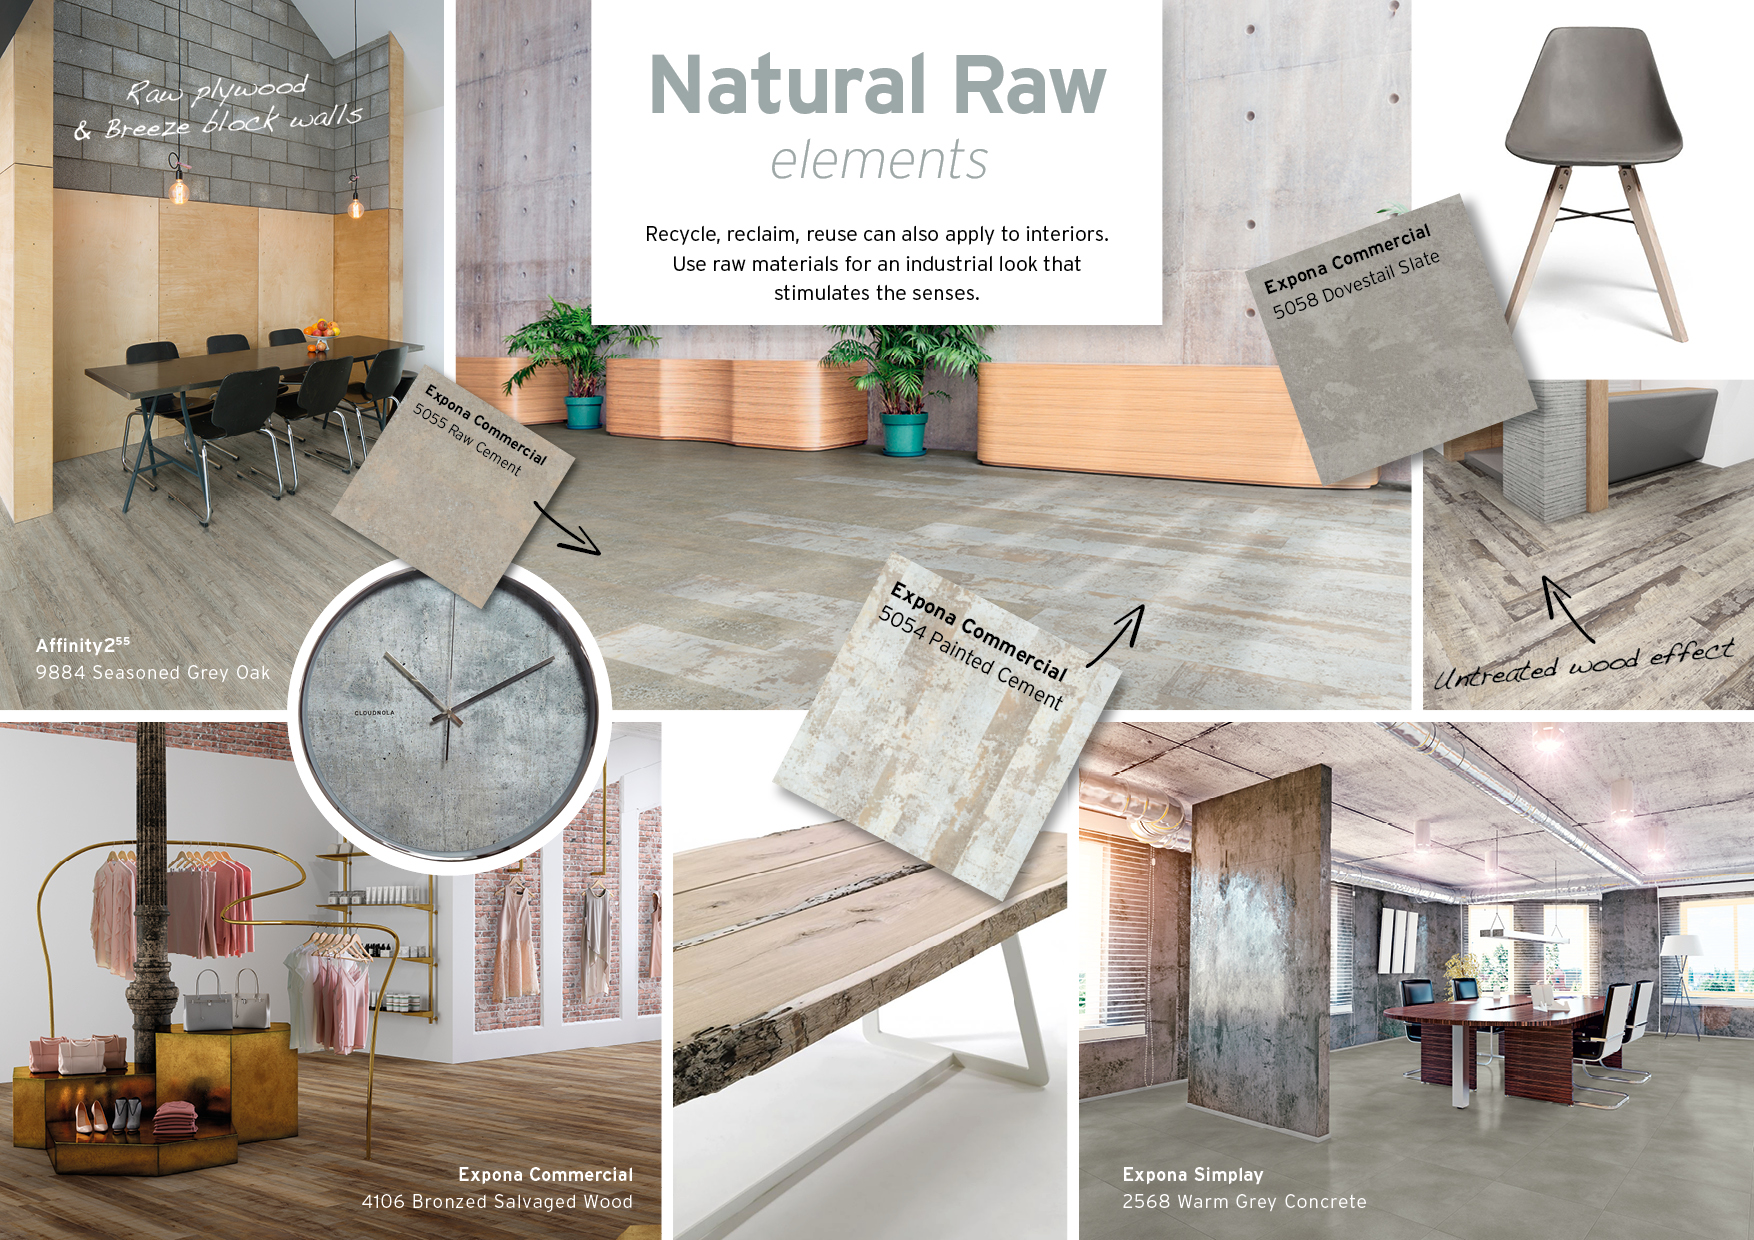 Image:LVT Trend Spotlight: Natural Raw Elements